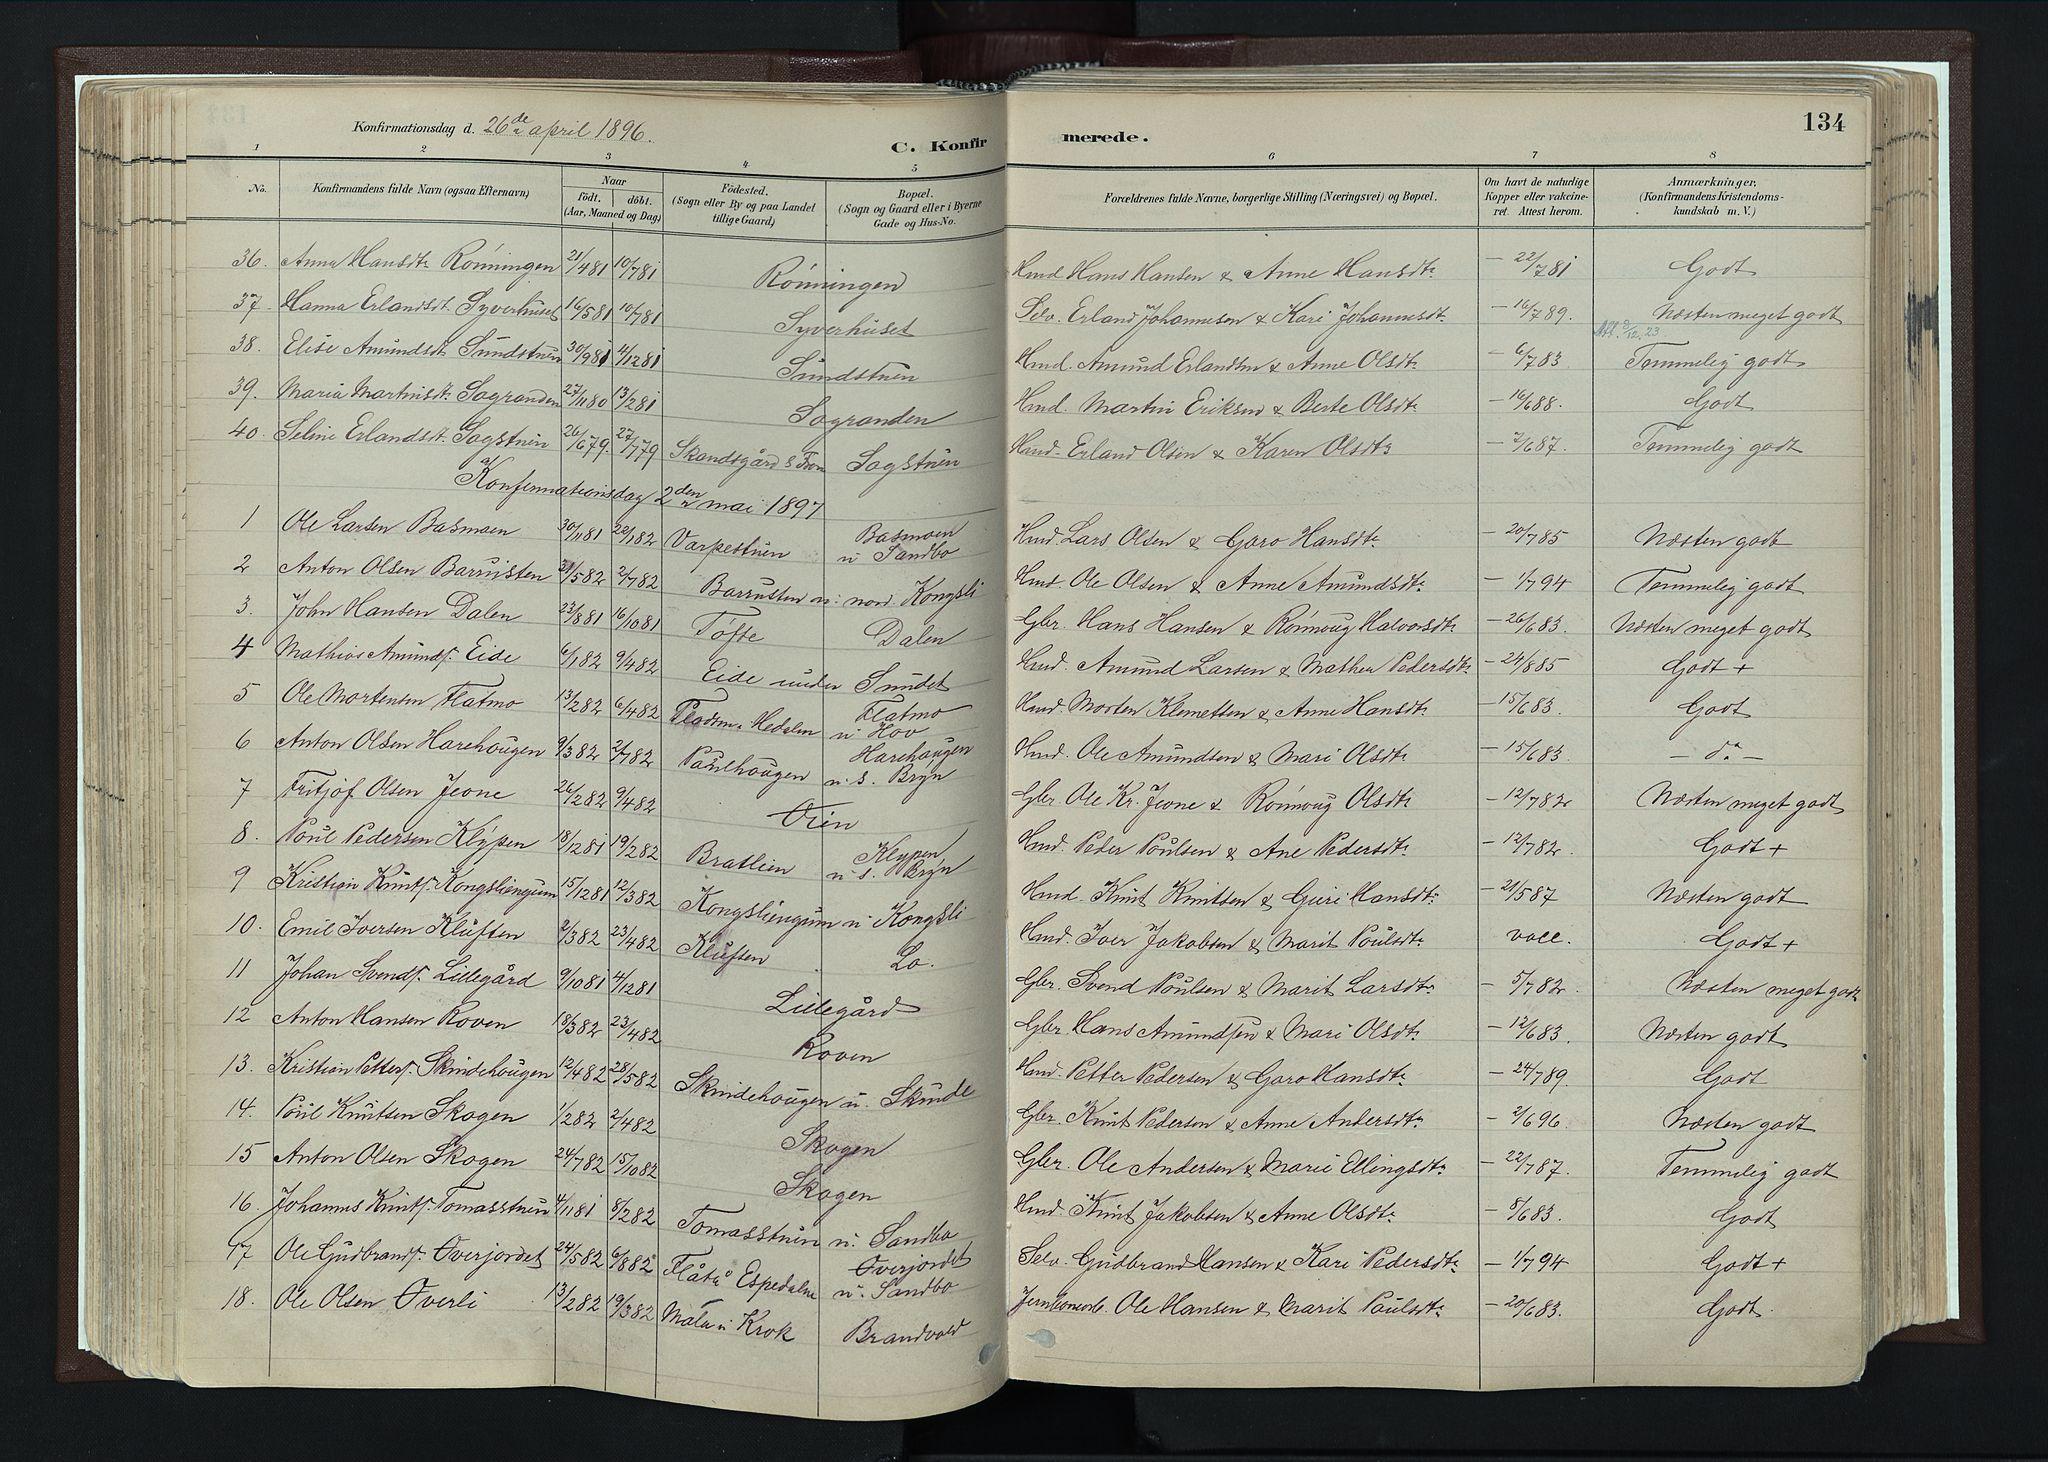 SAH, Nord-Fron prestekontor, Ministerialbok nr. 4, 1884-1914, s. 134